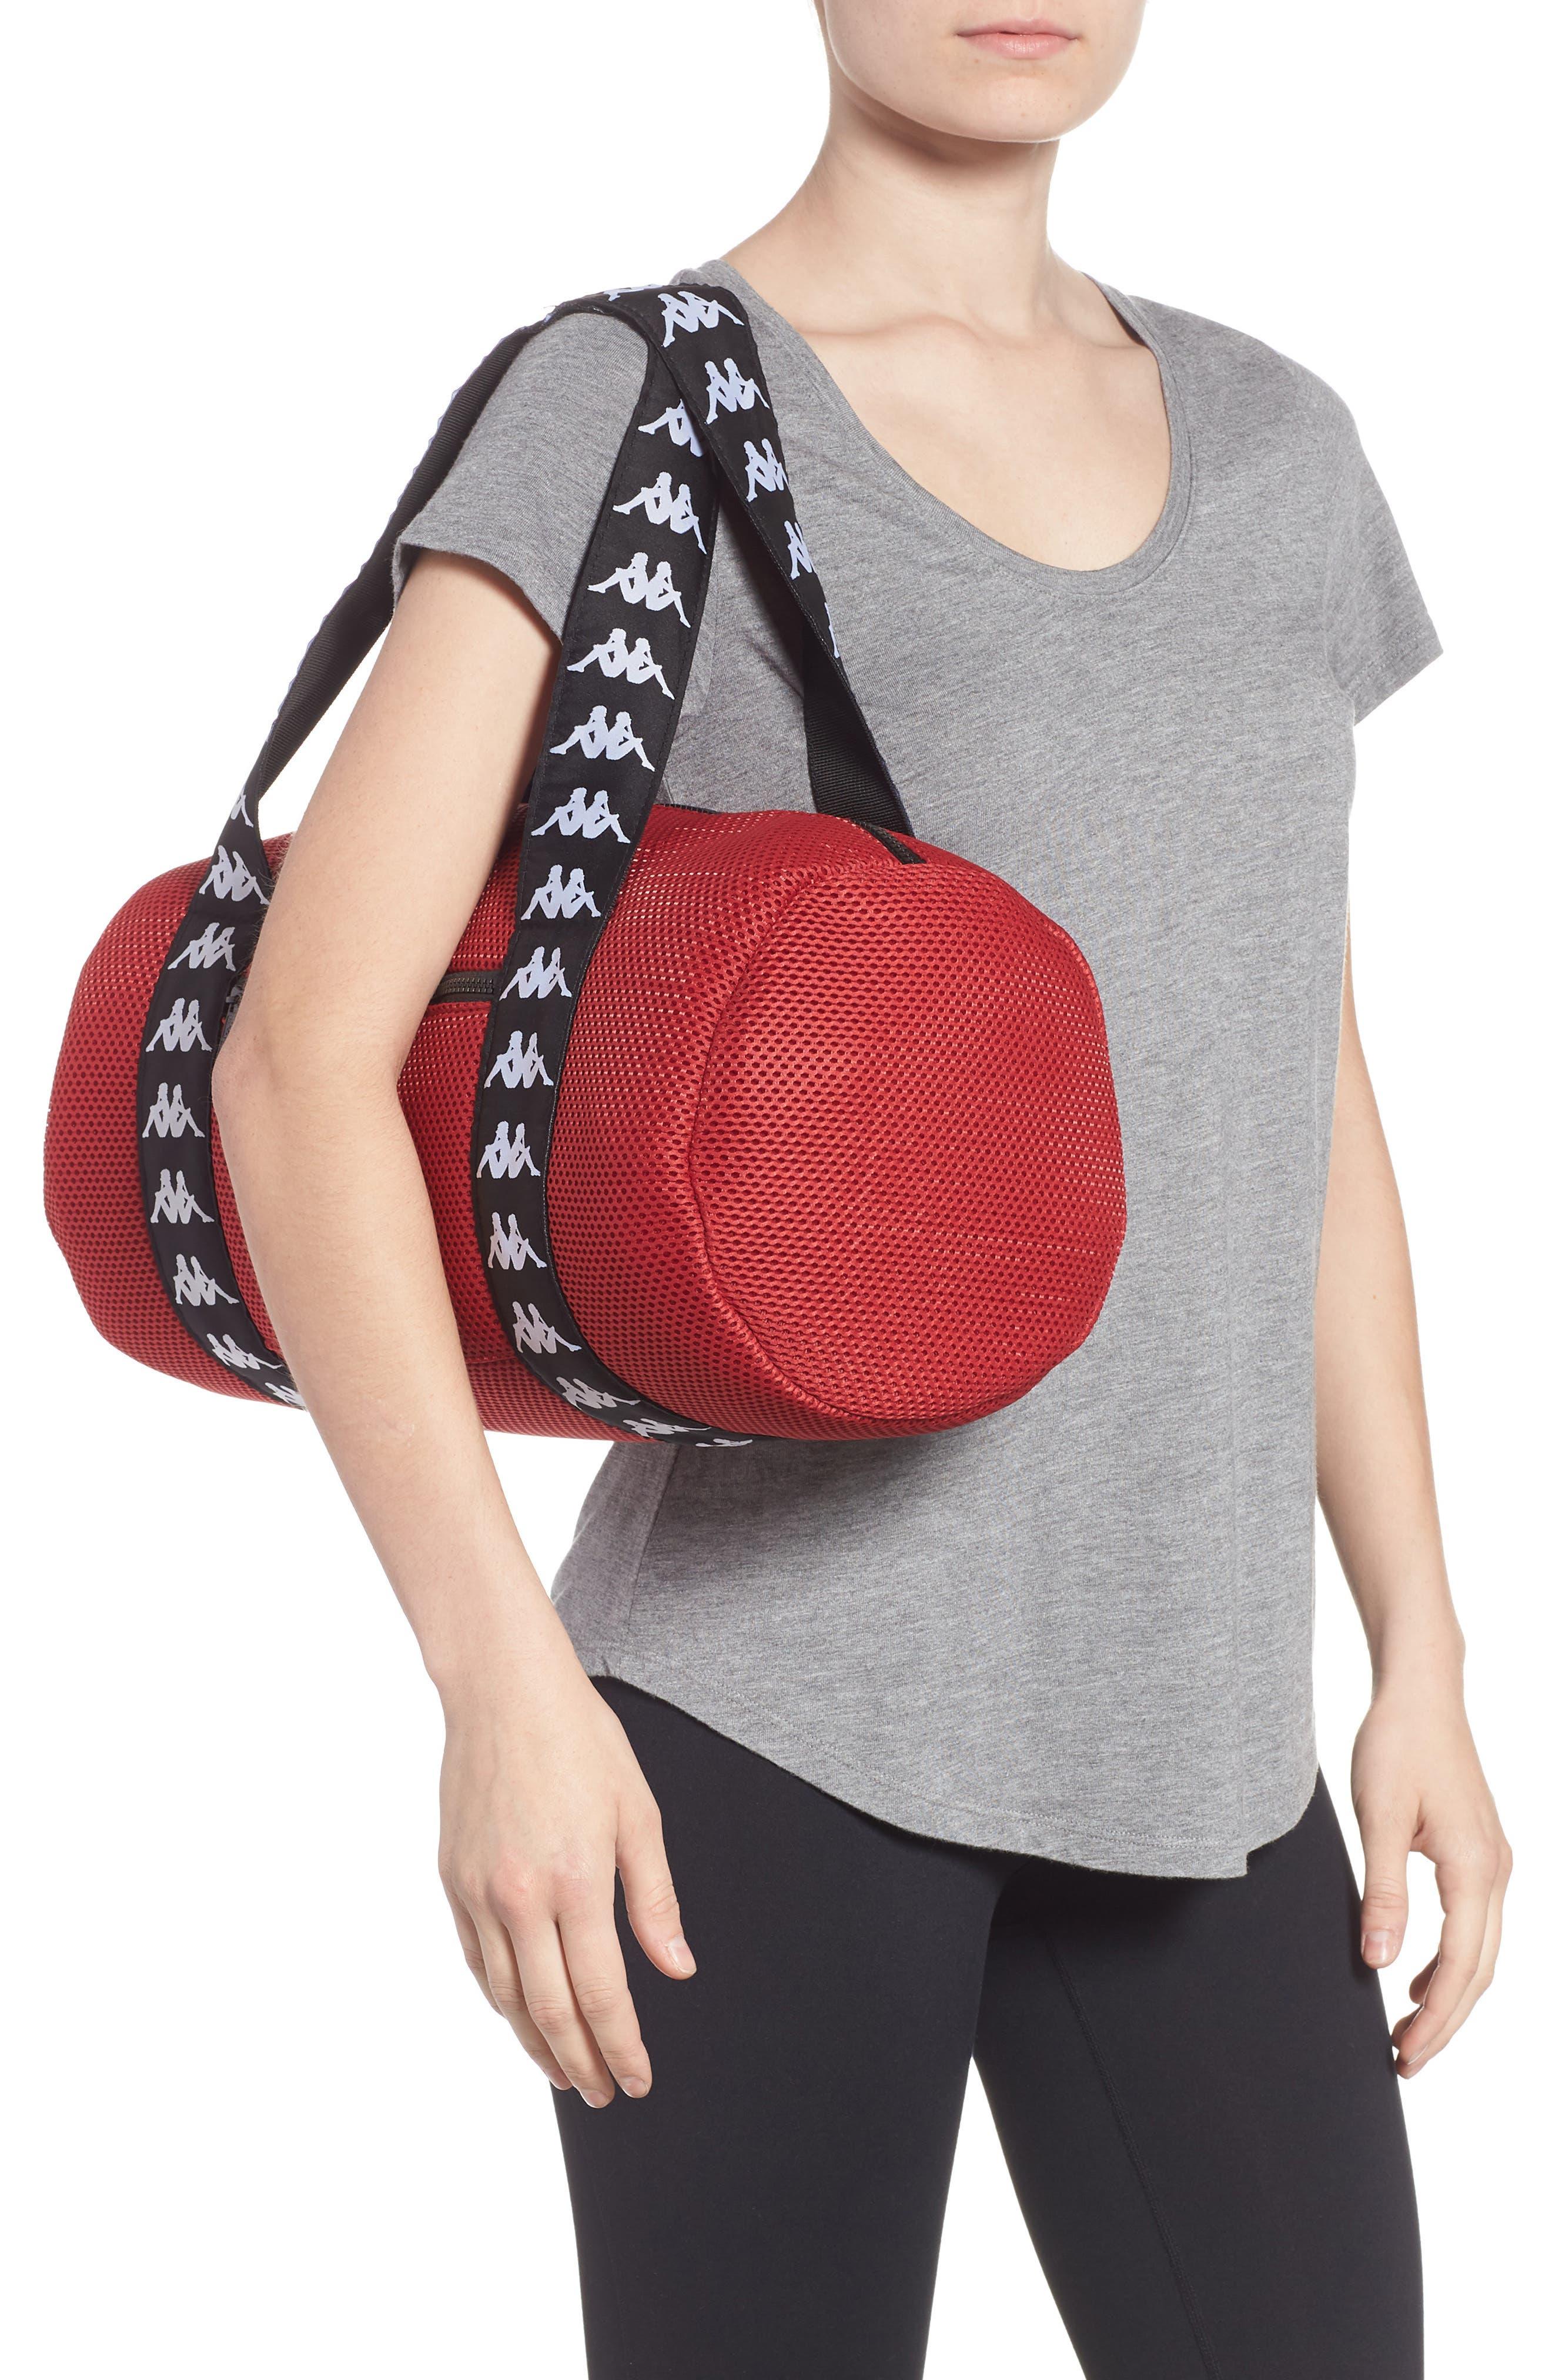 Large Mesh Athletic Duffel Bag,                             Alternate thumbnail 2, color,                             RED DK-BLACK-WHITE